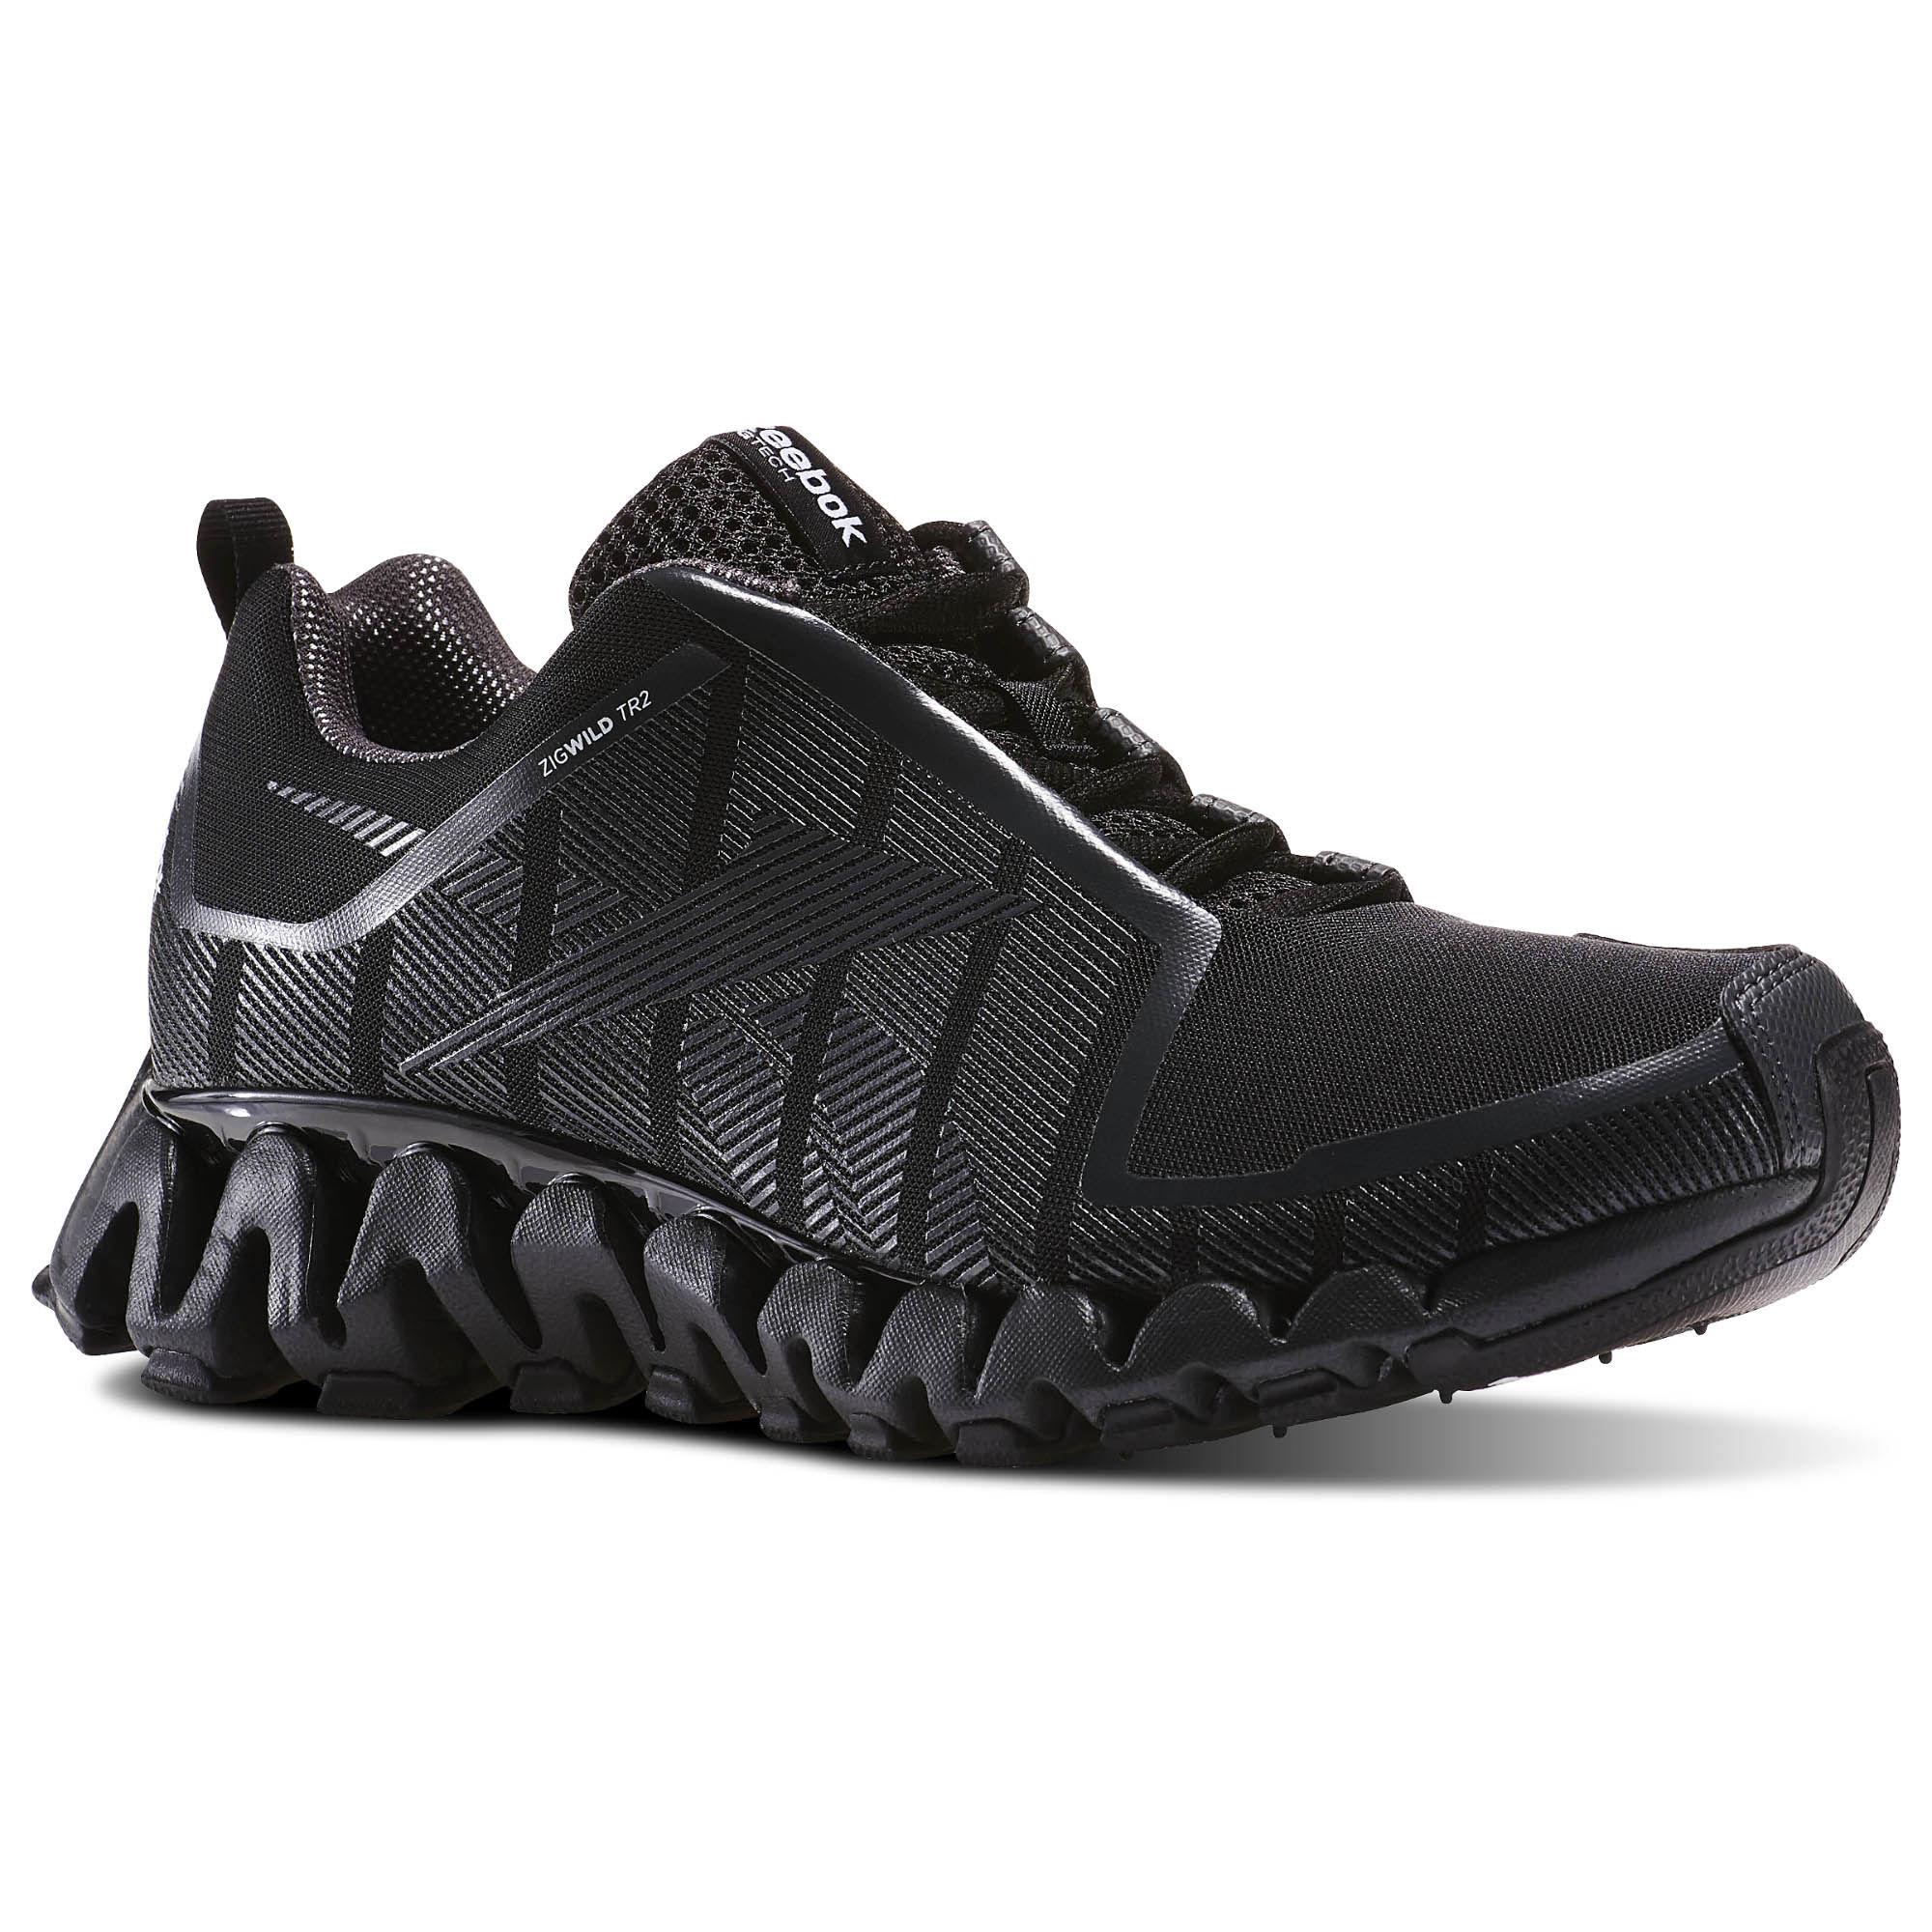 d0d5e4cfccecbe Reebok Zig Wild TR2 Running Mens Shoes Sneakers